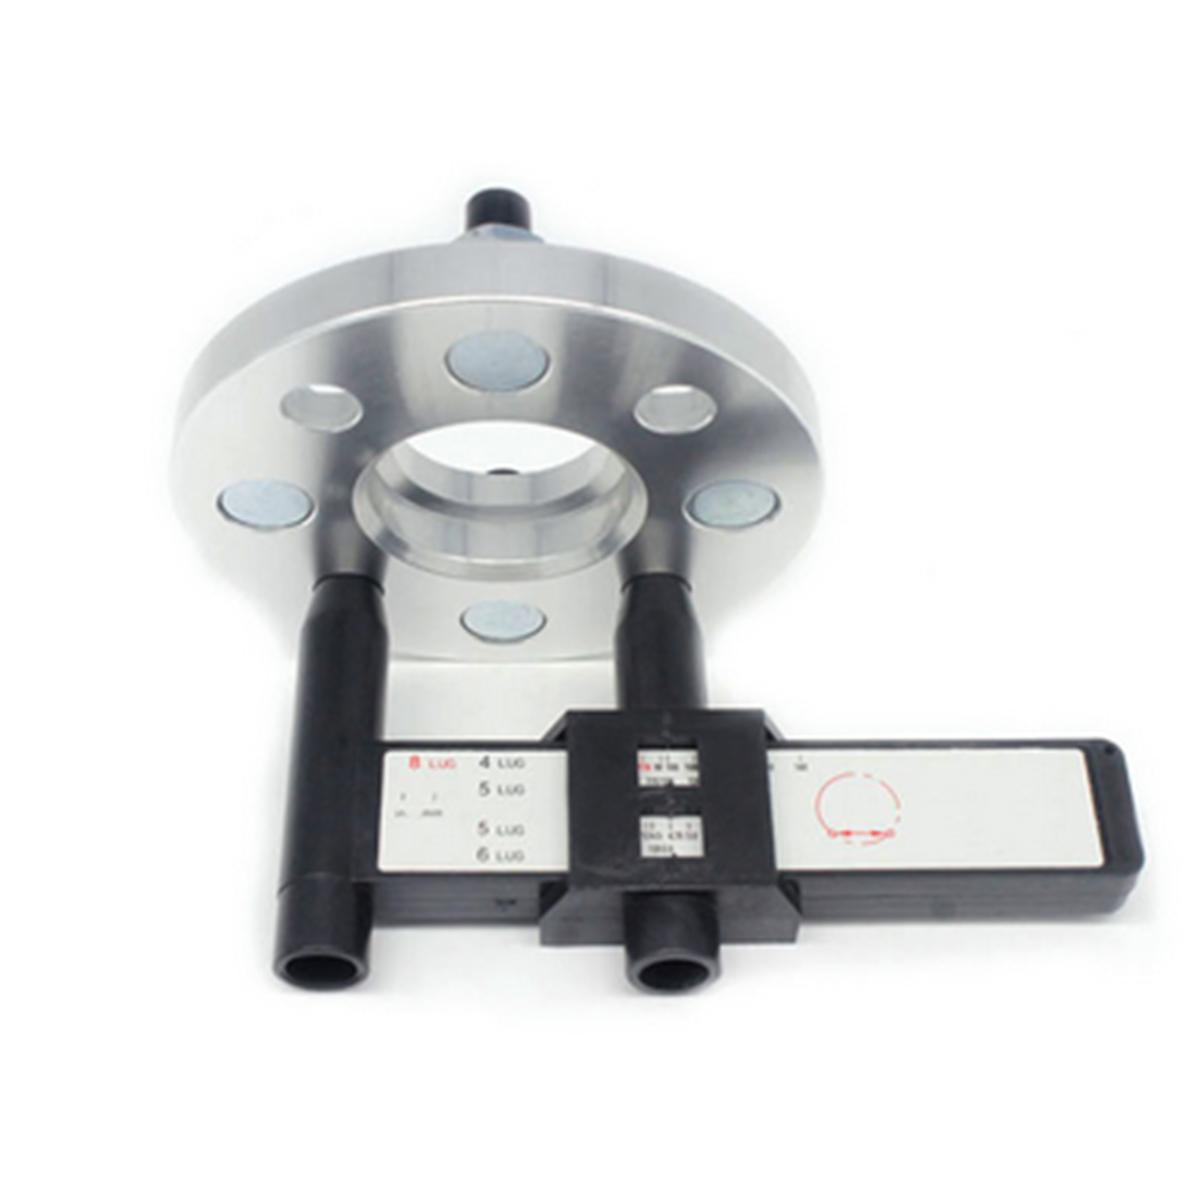 4 5 6 8 Holes Lug Wheel Bolt Pattern Gauge Measuring Measurement Hand Tool dedj